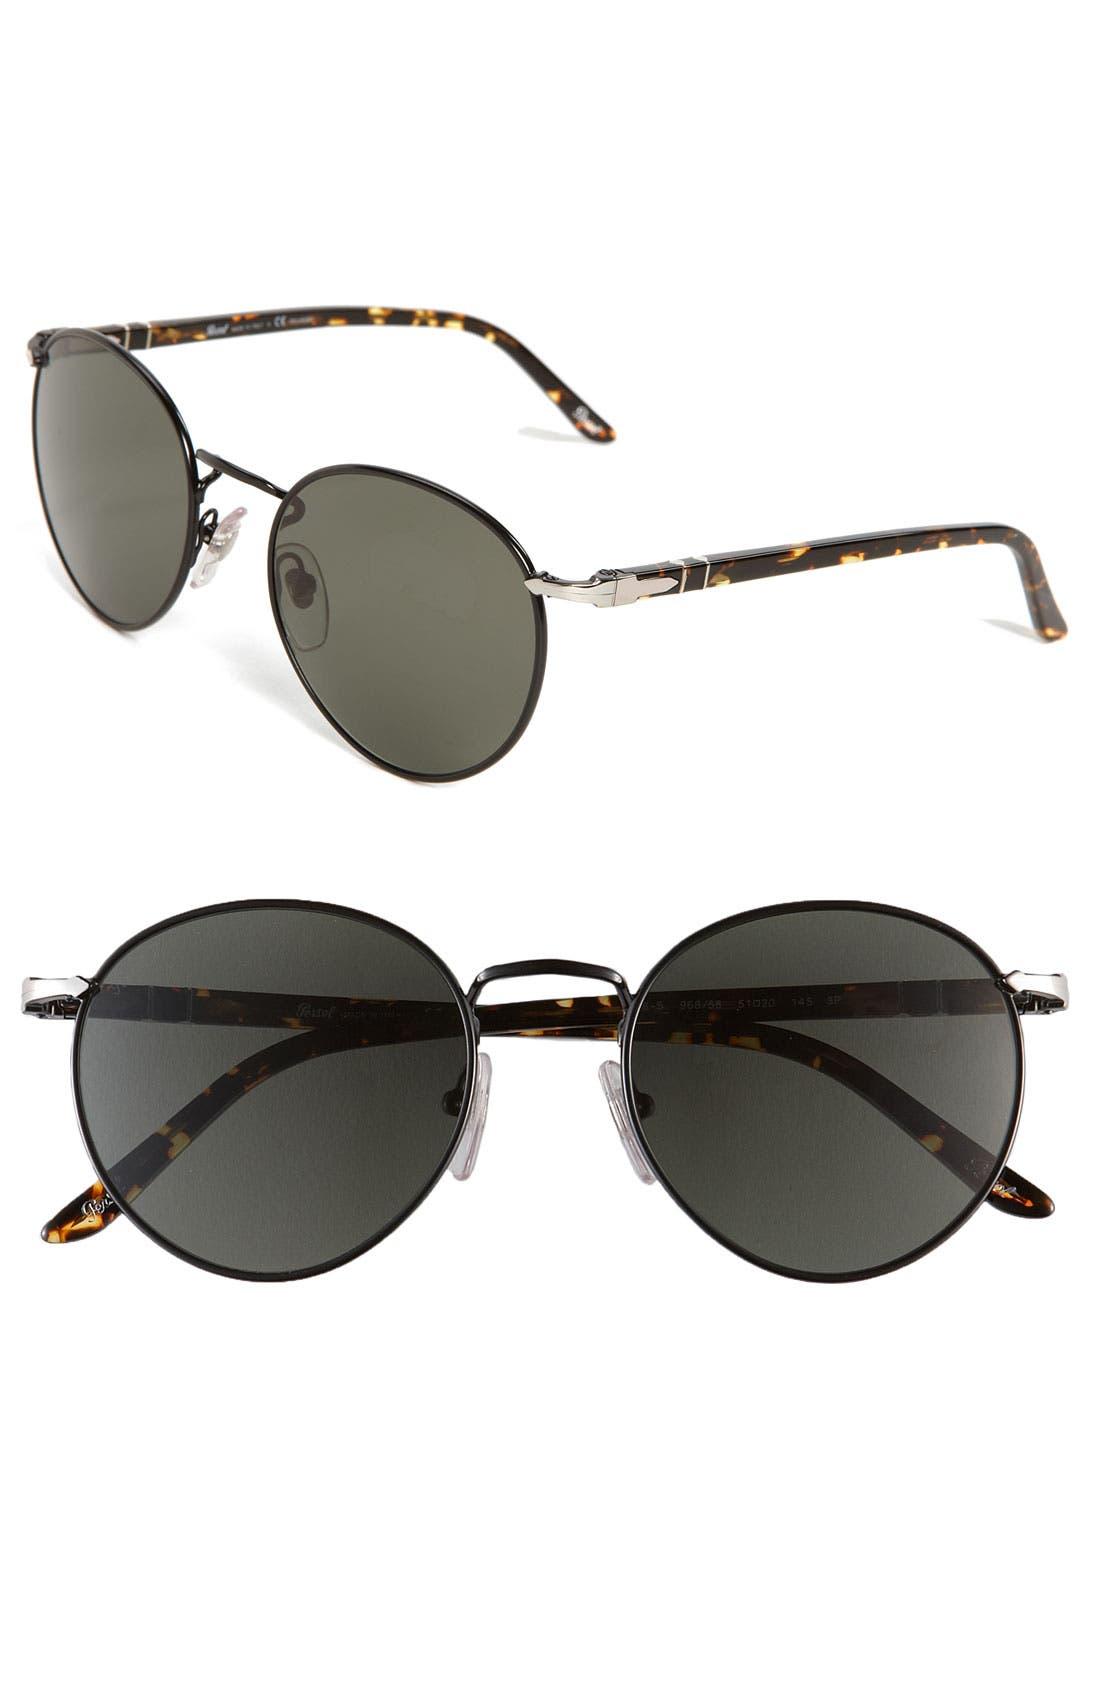 Main Image - Persol Round Polarized Sunglasses